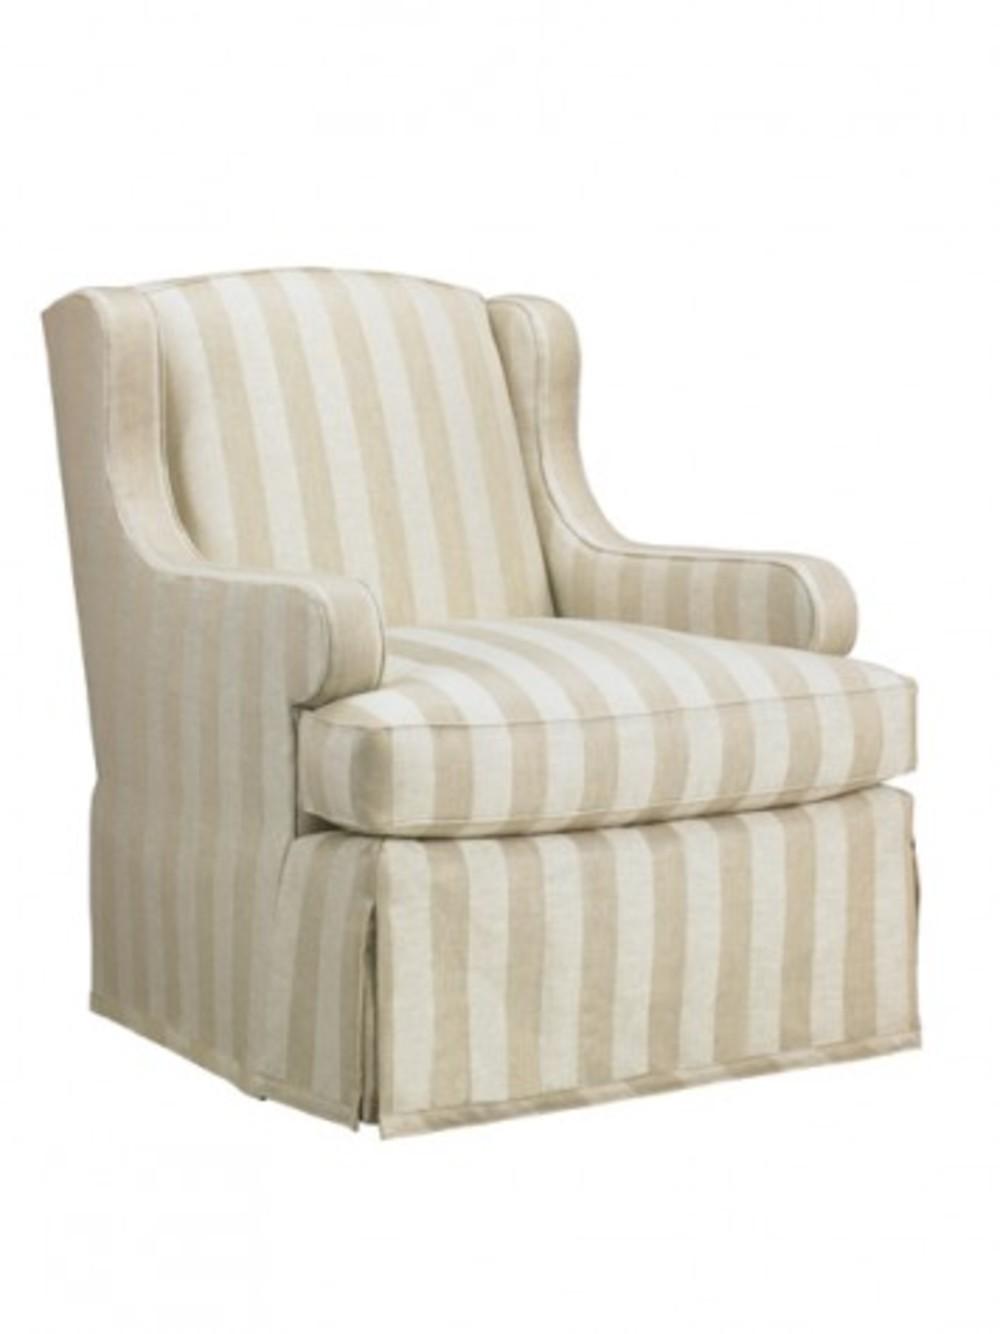 Mr. and Mrs. Howard by Sherrill Furniture - Sedan Chair